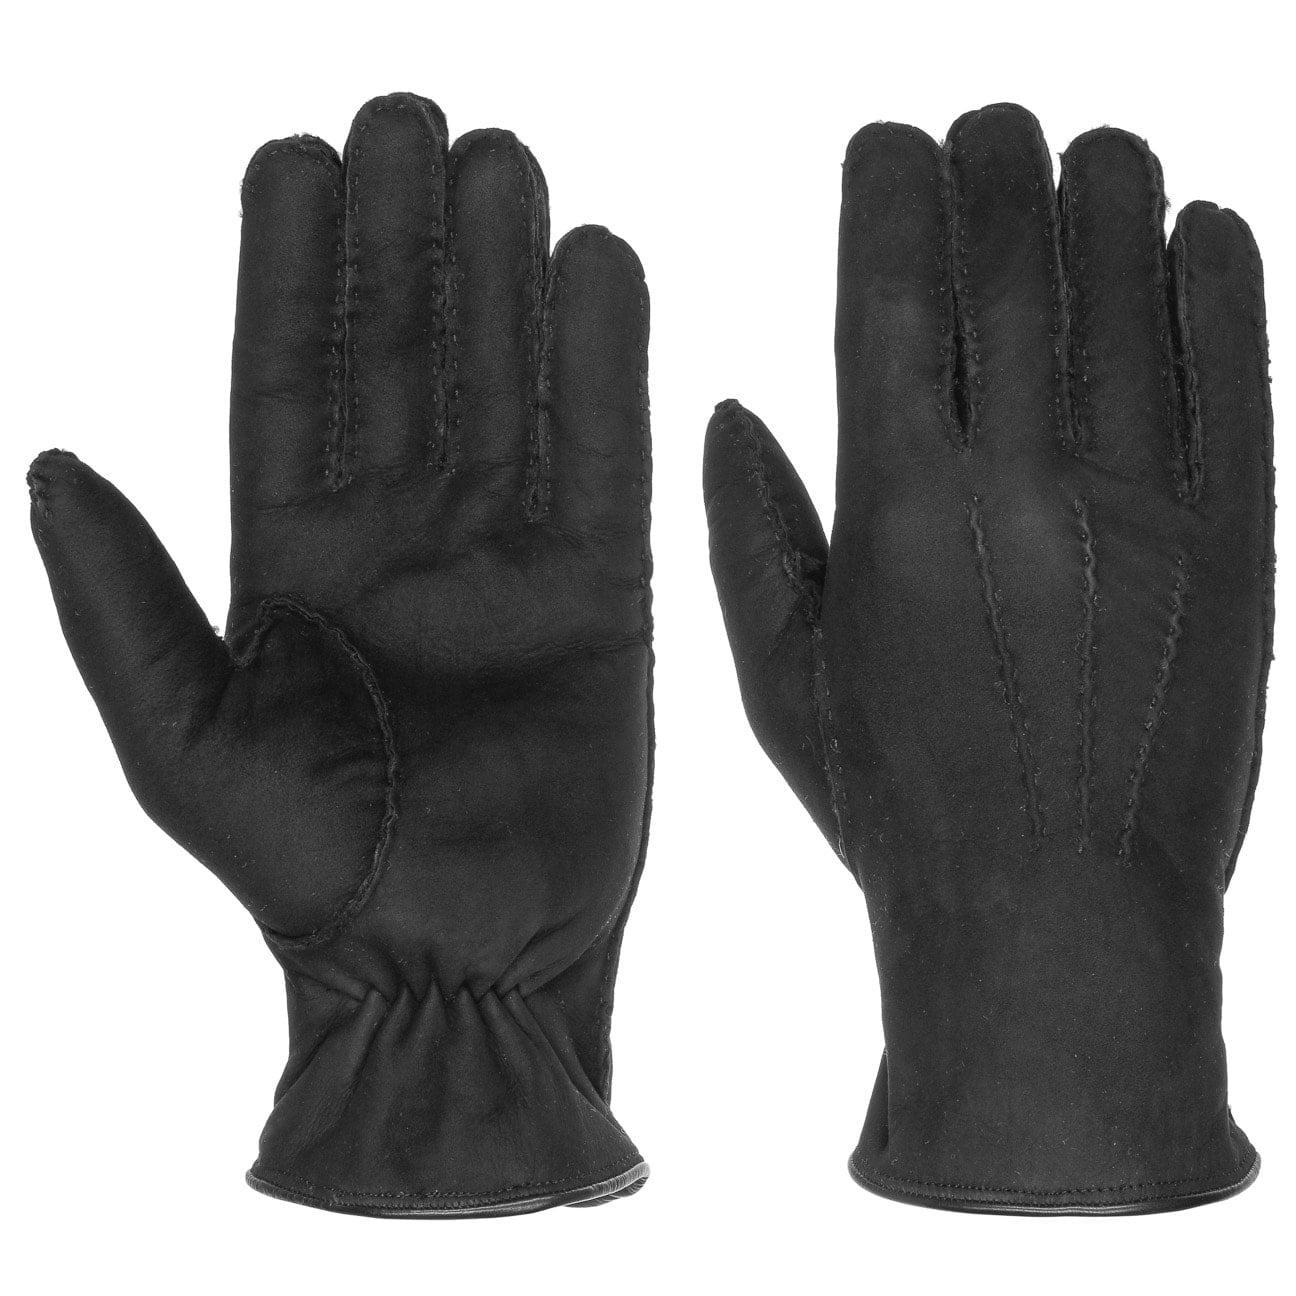 Gants pour Homme Lambskin by Caridei  gants avec dogits